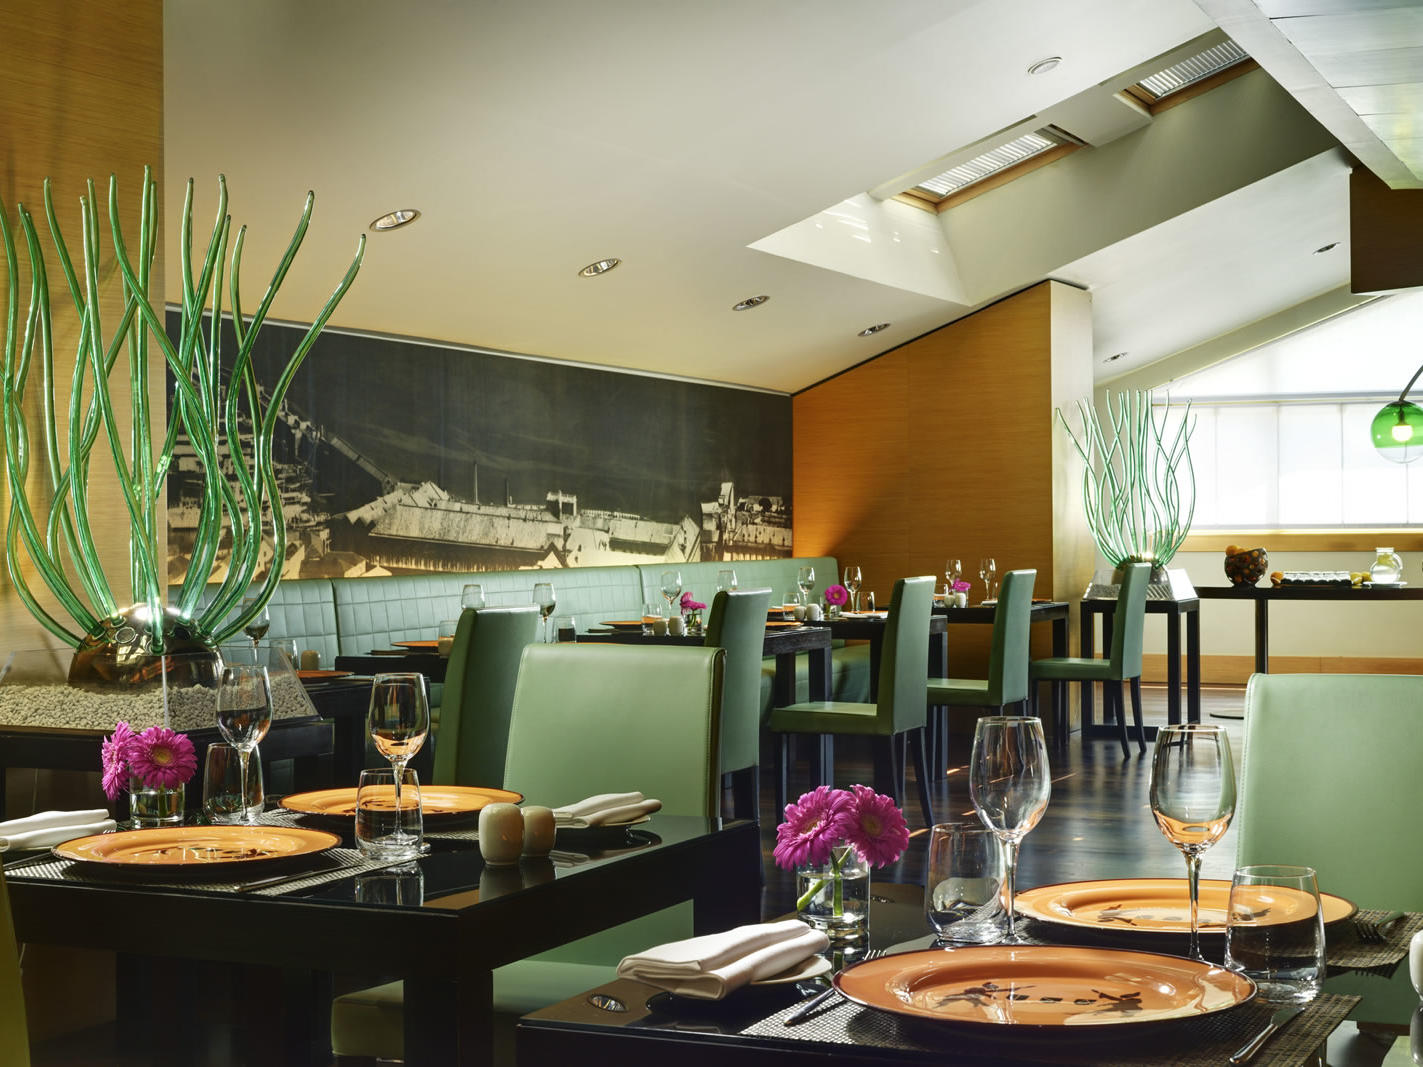 Vesuvio Roof Bar & Restaurant